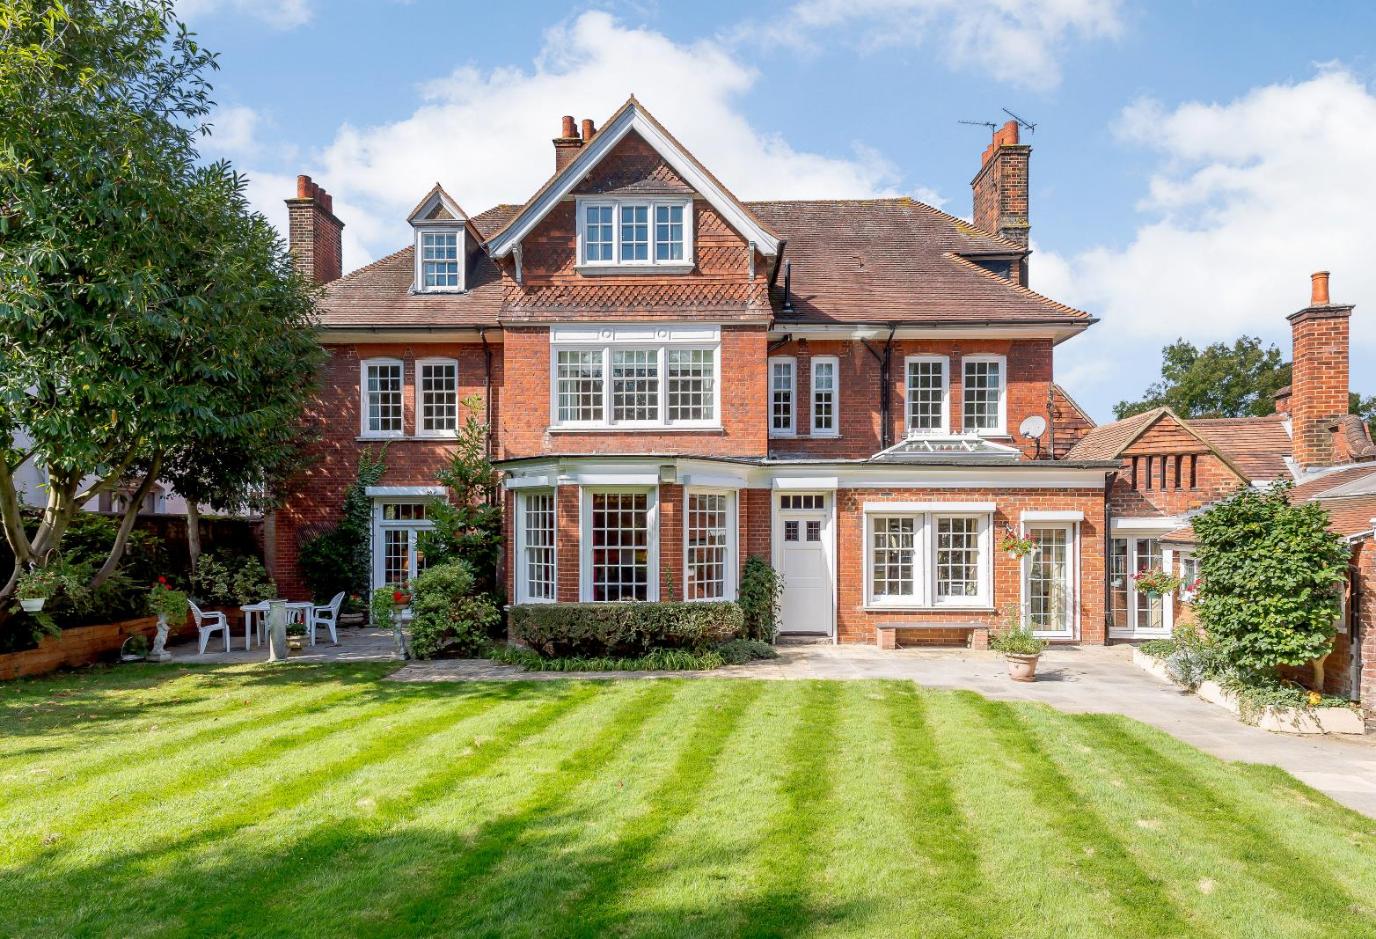 Ealing London Dutch Grade II listed mansion house